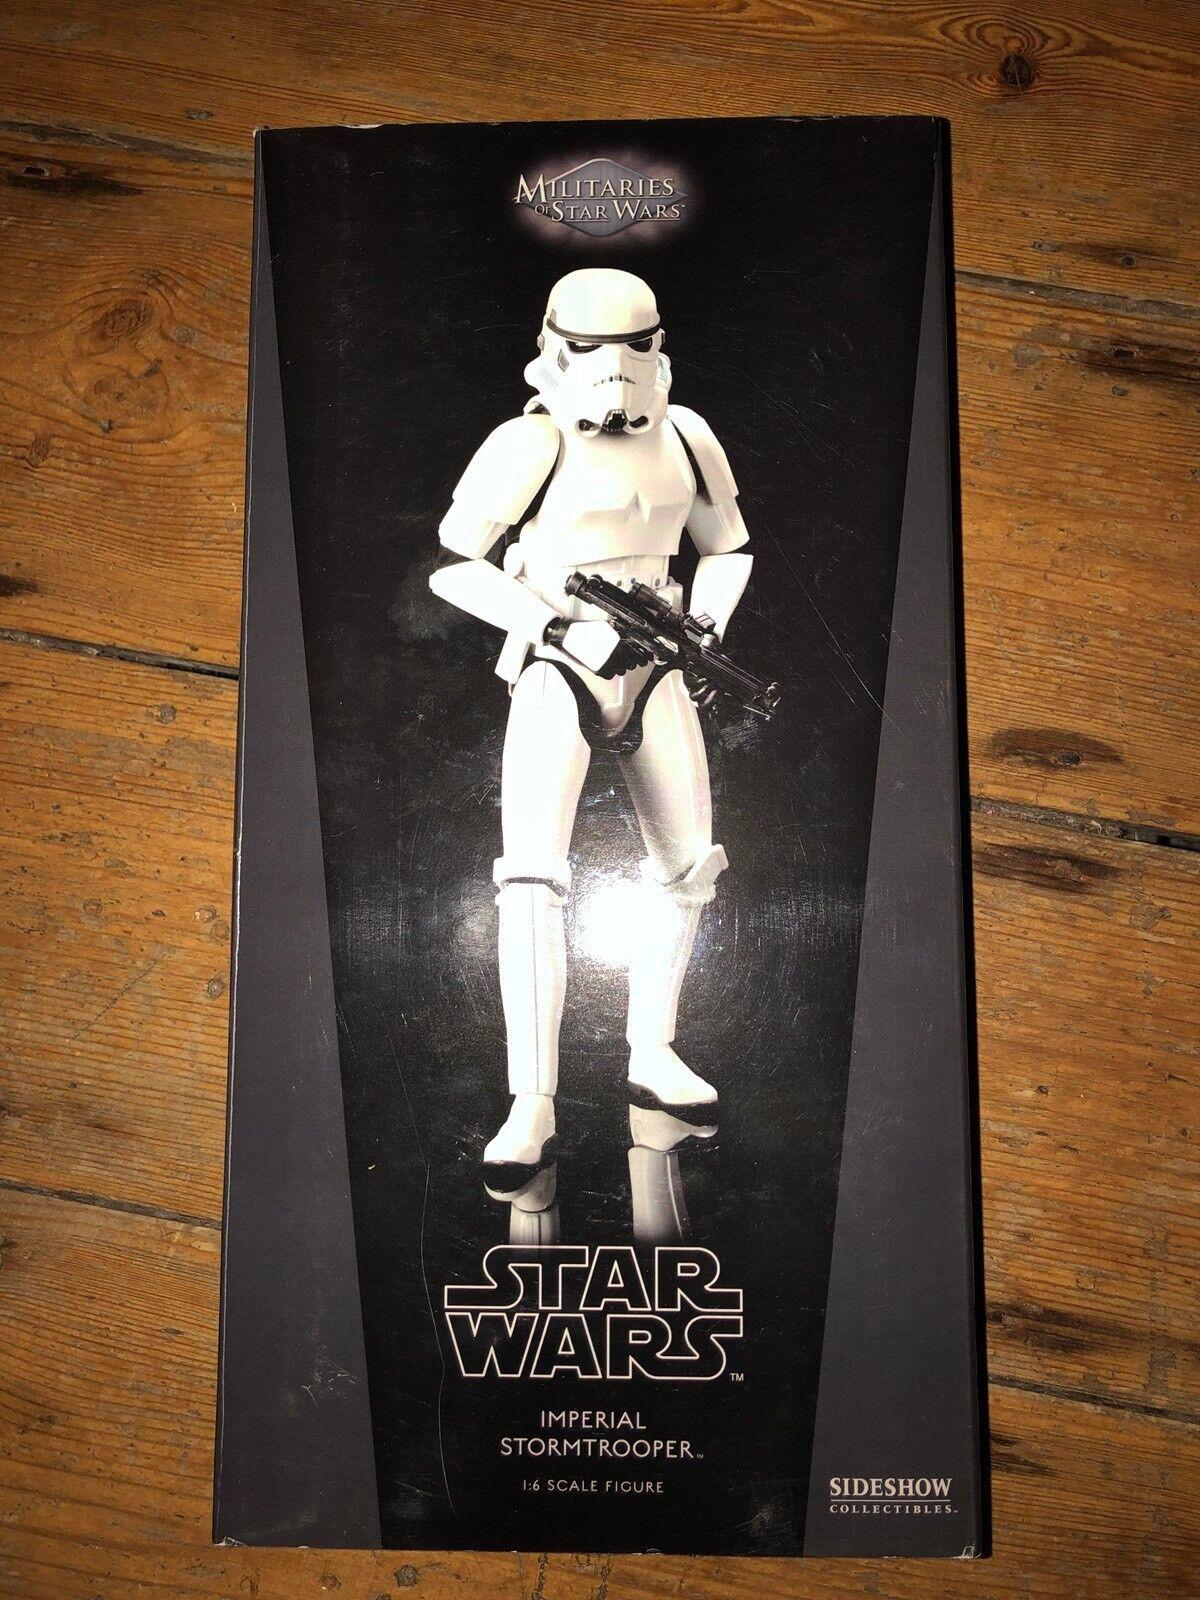 Sideshow ejércitos de Star Wars Star Wars Stormtrooper Imperial afssc 1045